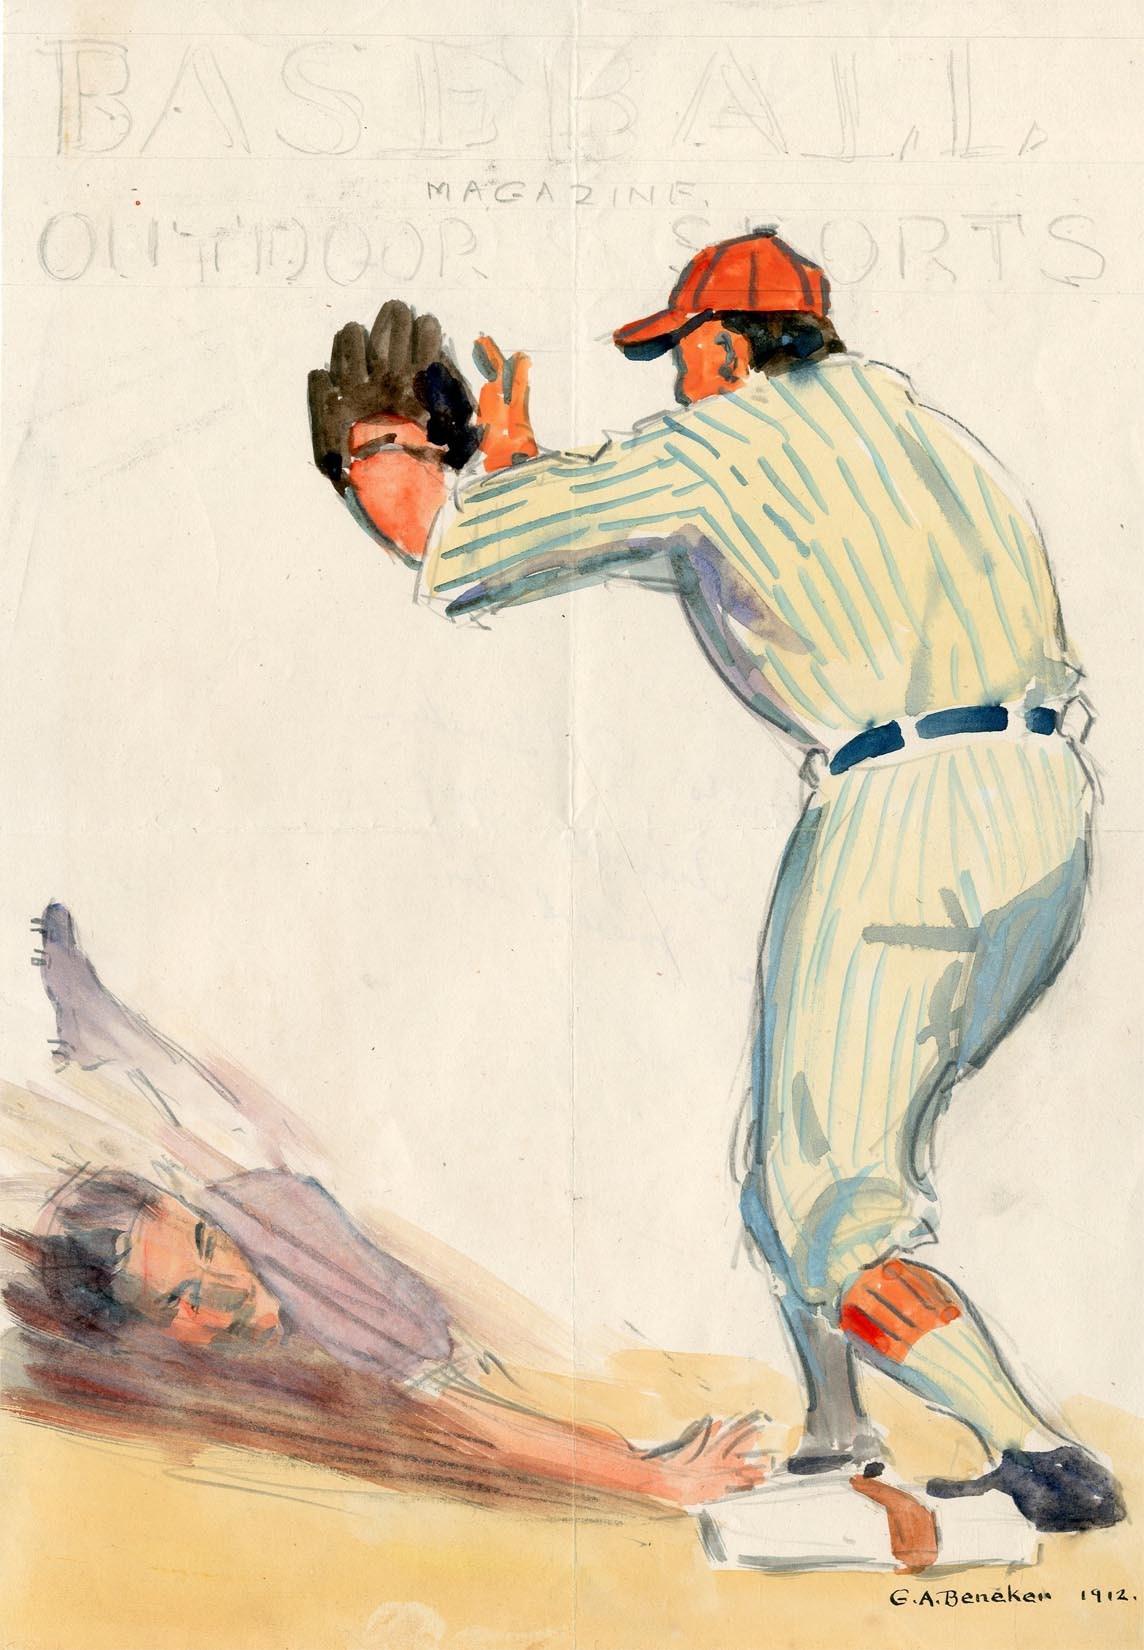 The Baseball Magazine Original Art - 2018 Invitational